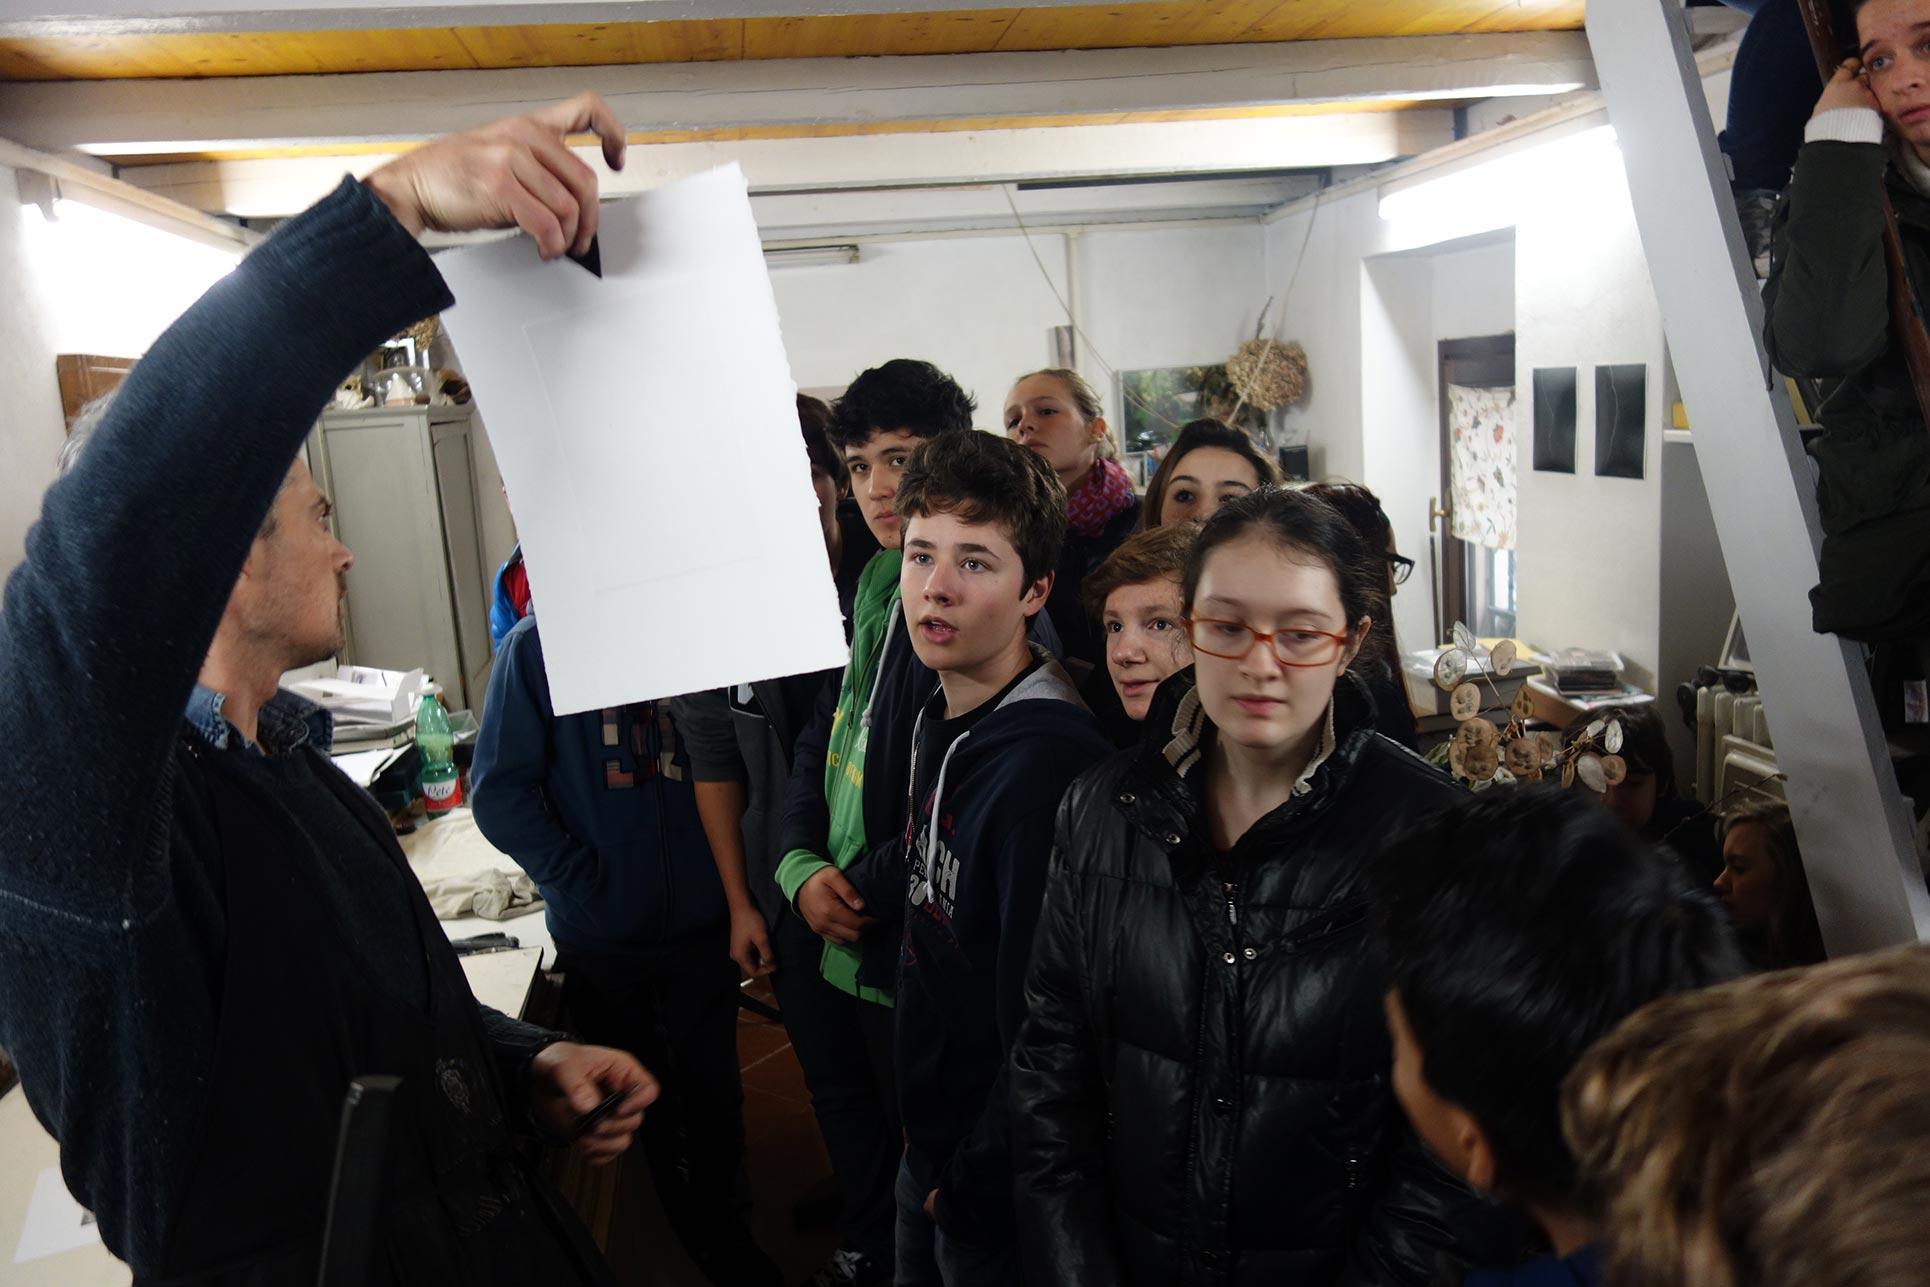 Tancredi Mangano demonstrates how his etching press functions. (Photo: Barbara Fässler)